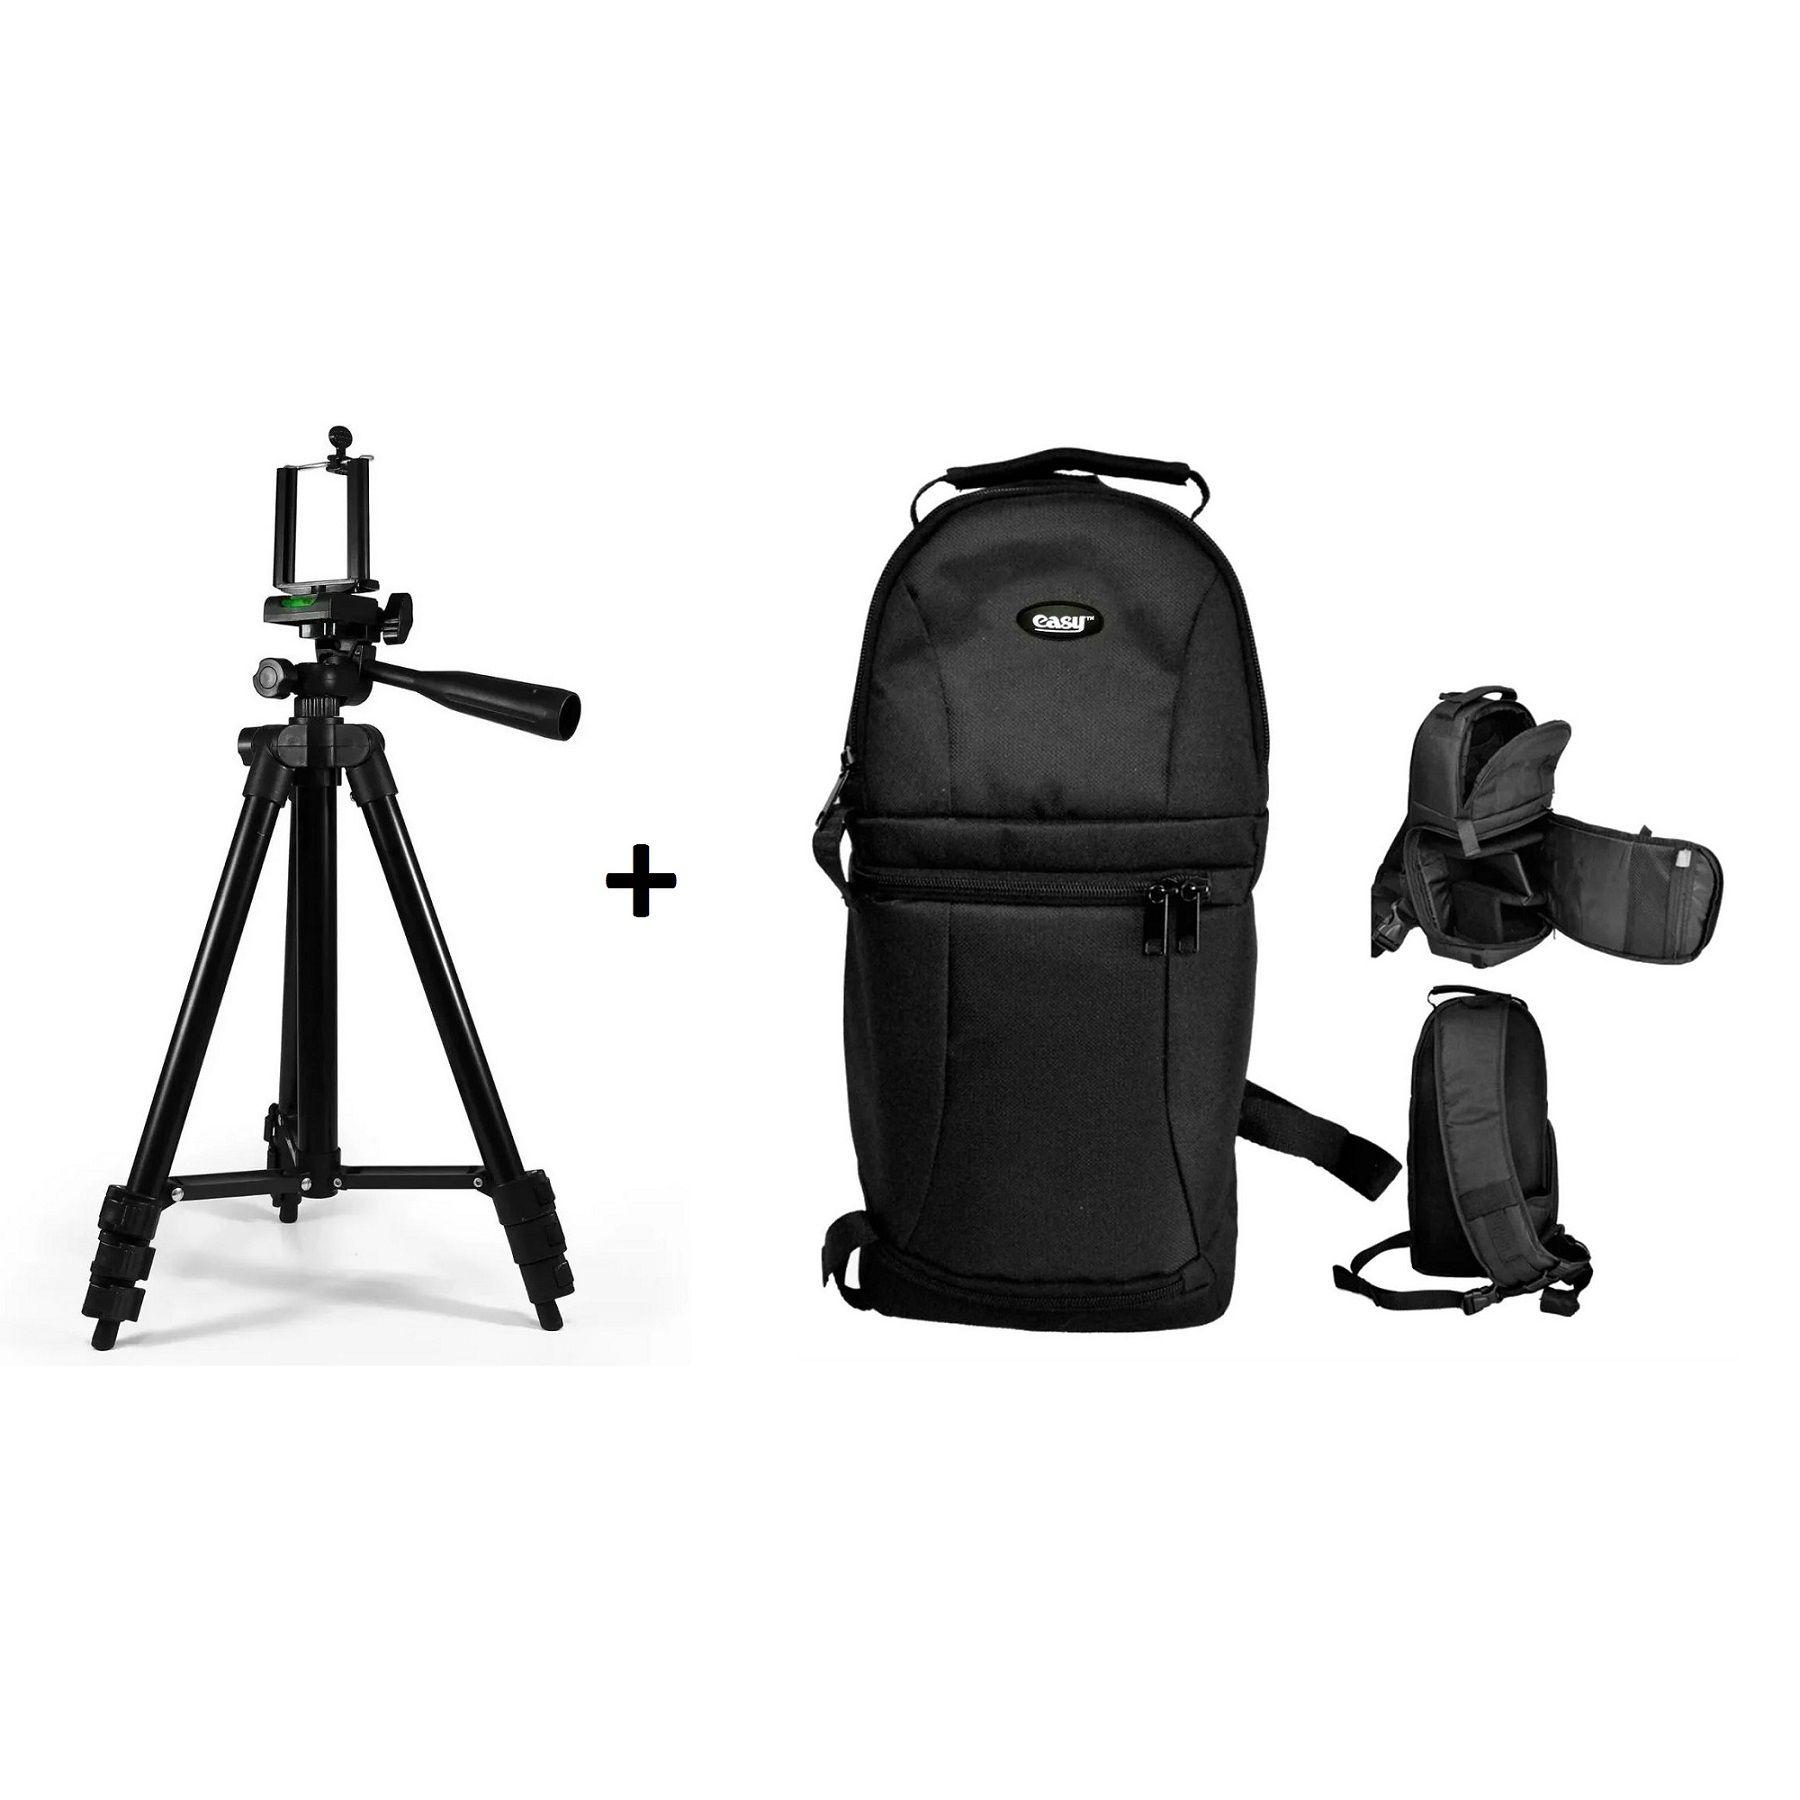 Kit Mochila Compacta Para Câmera + Tripé Telescópico 1,2m - EC-8825FE+SL-2111H